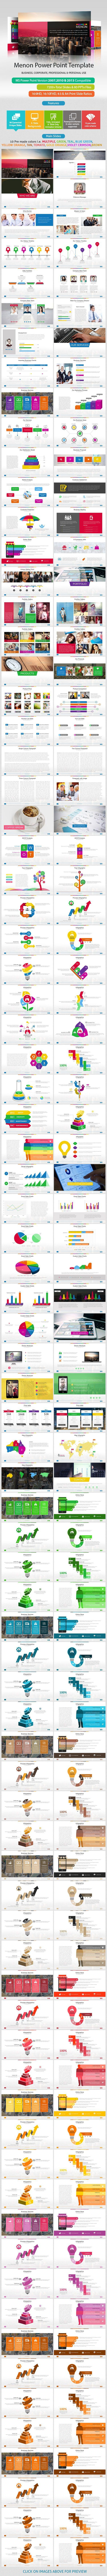 Menon Power Point Presentation #design Download: http://graphicriver.net/item/menon-power-point-presentation/11255009?ref=ksioks